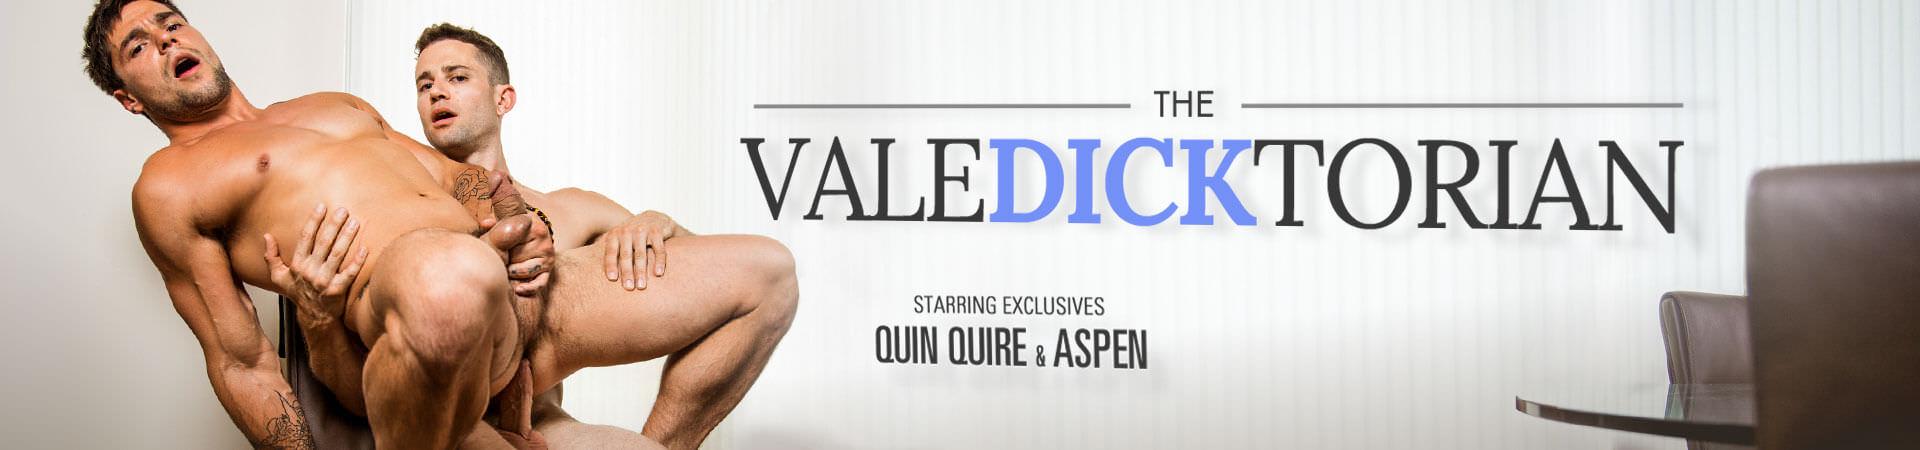 The ValeDickTorian Featuring Aspen and Quin Quire